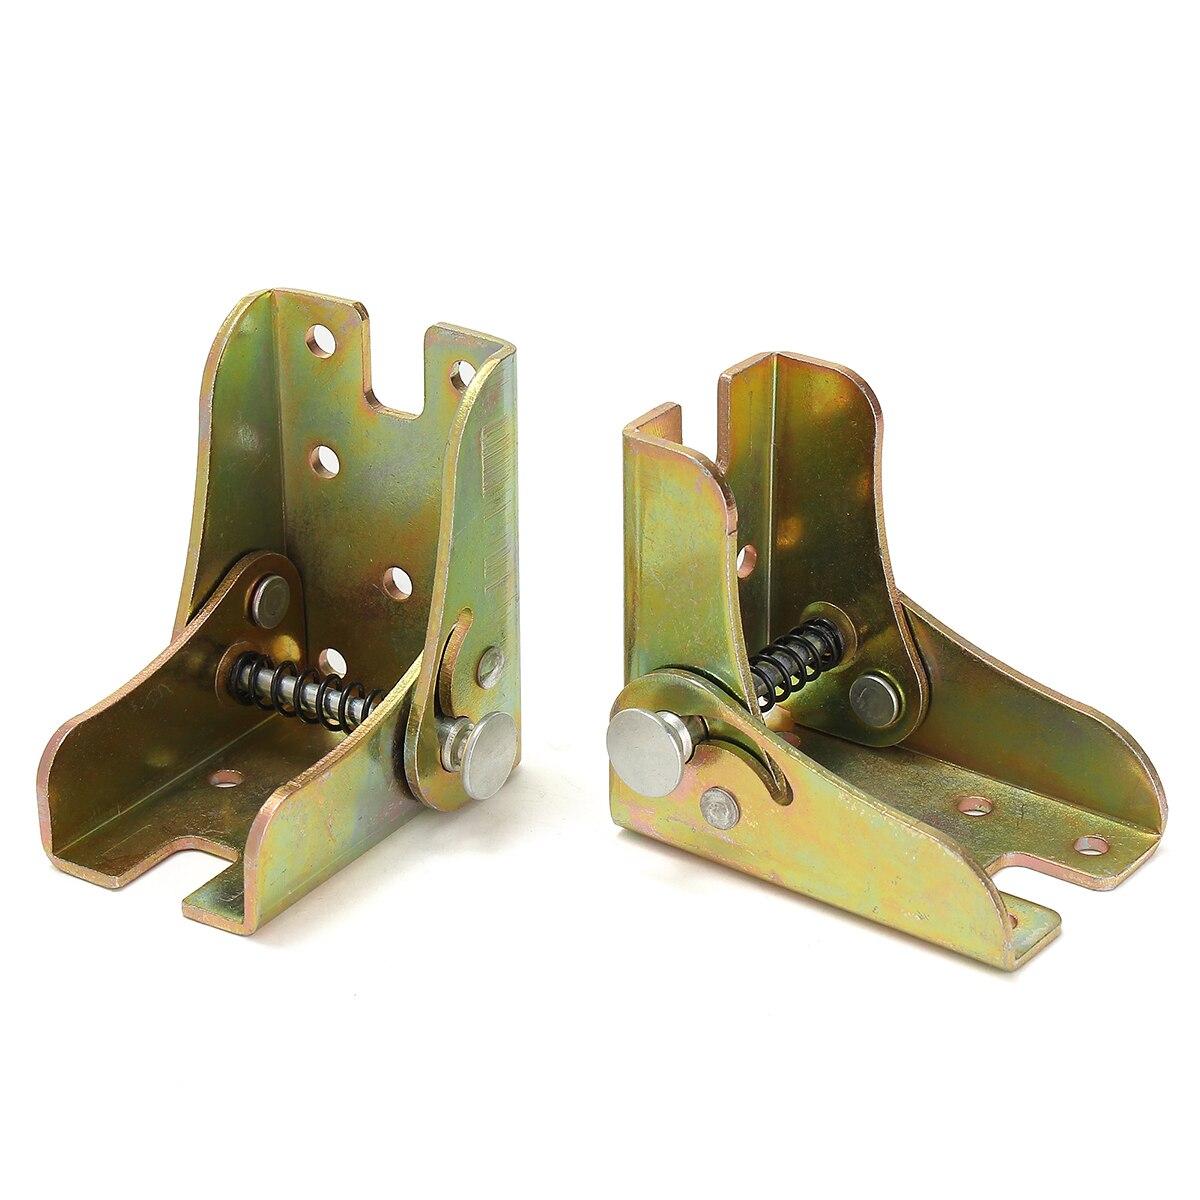 Responsible Funssor Aluminum Folding Foldable Adjustable Table Desk Bench Top Bar Leg Feet Rv Hardware Furniture Hardware